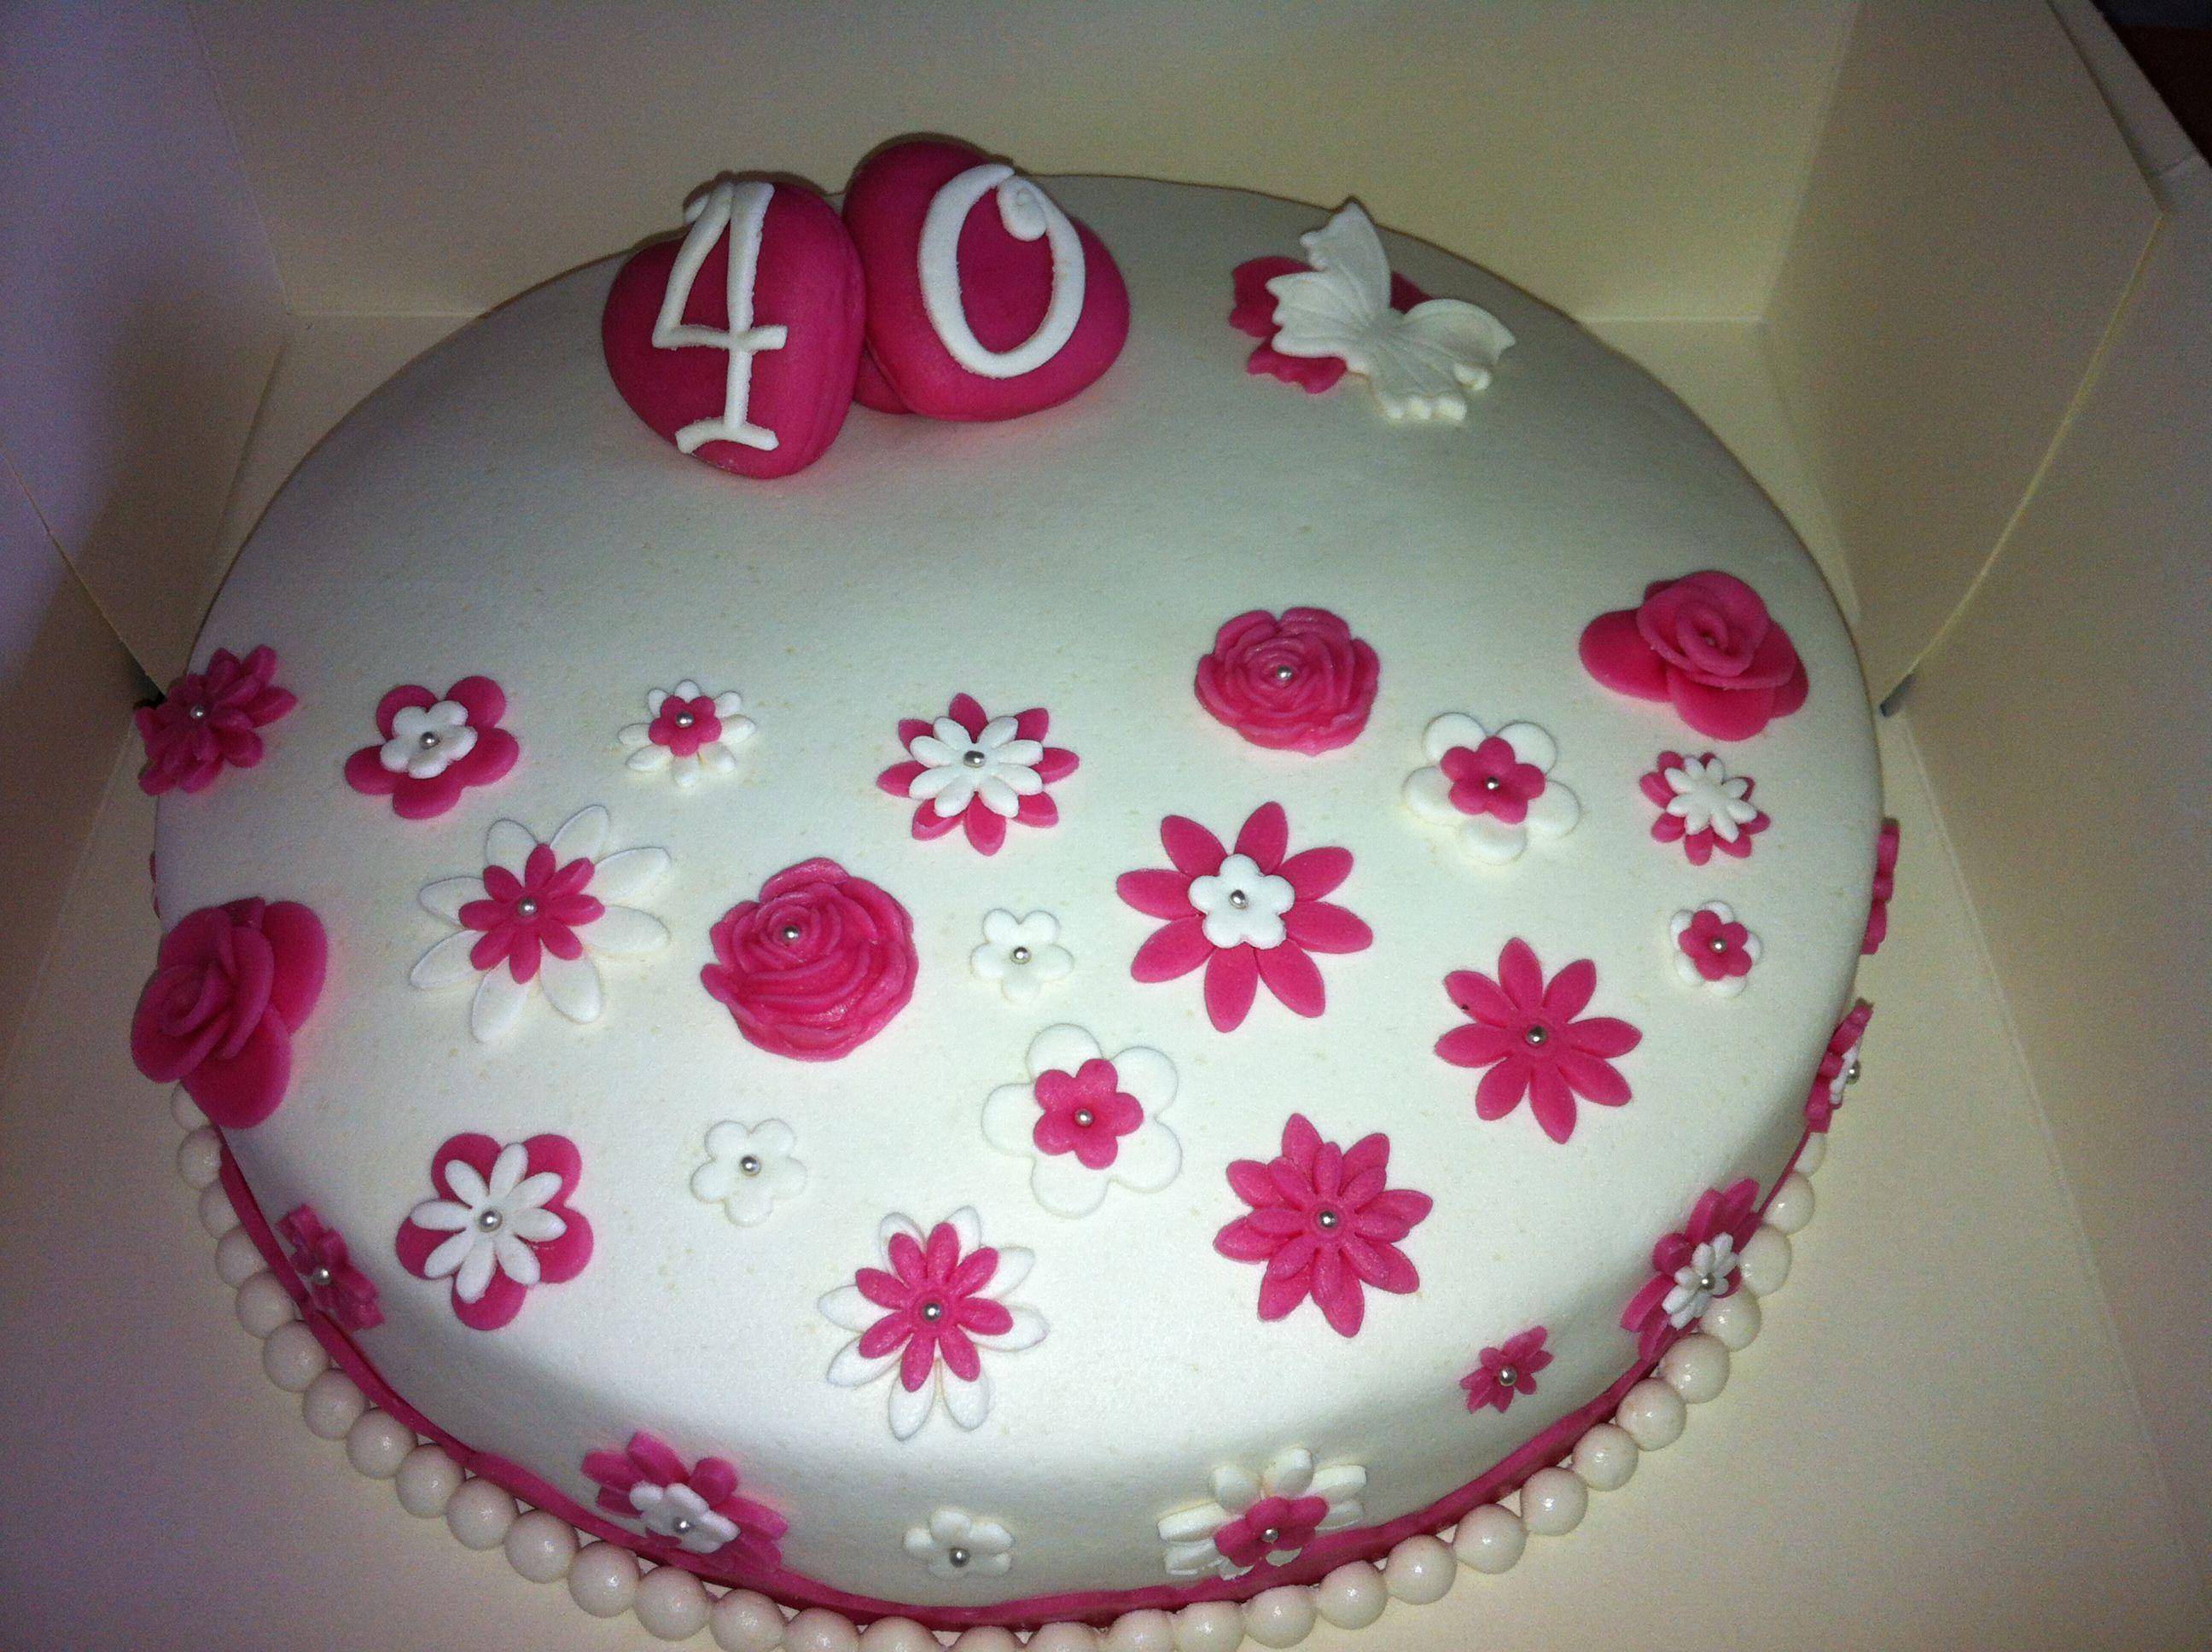 Super Taart 40 jaar getrouwd (vulling bonbonbloccreme/kersenjam) #cake TS-42